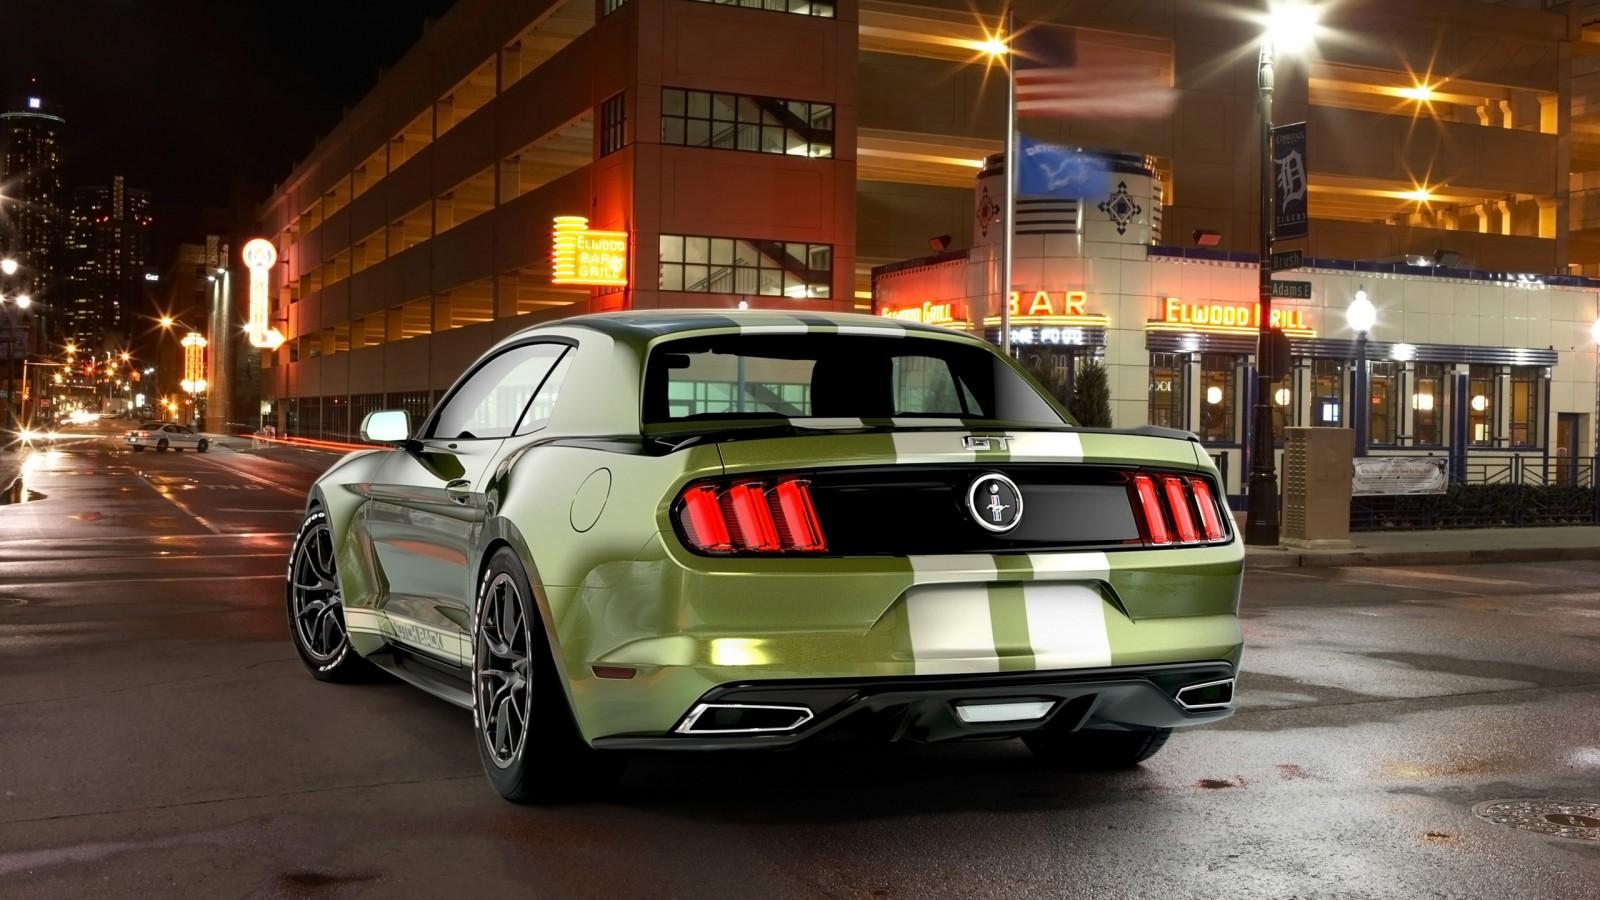 1080p Car Wallpaper Pack 2017 Ford Mustang Notchback Design 2 Wallpaper Hd Car